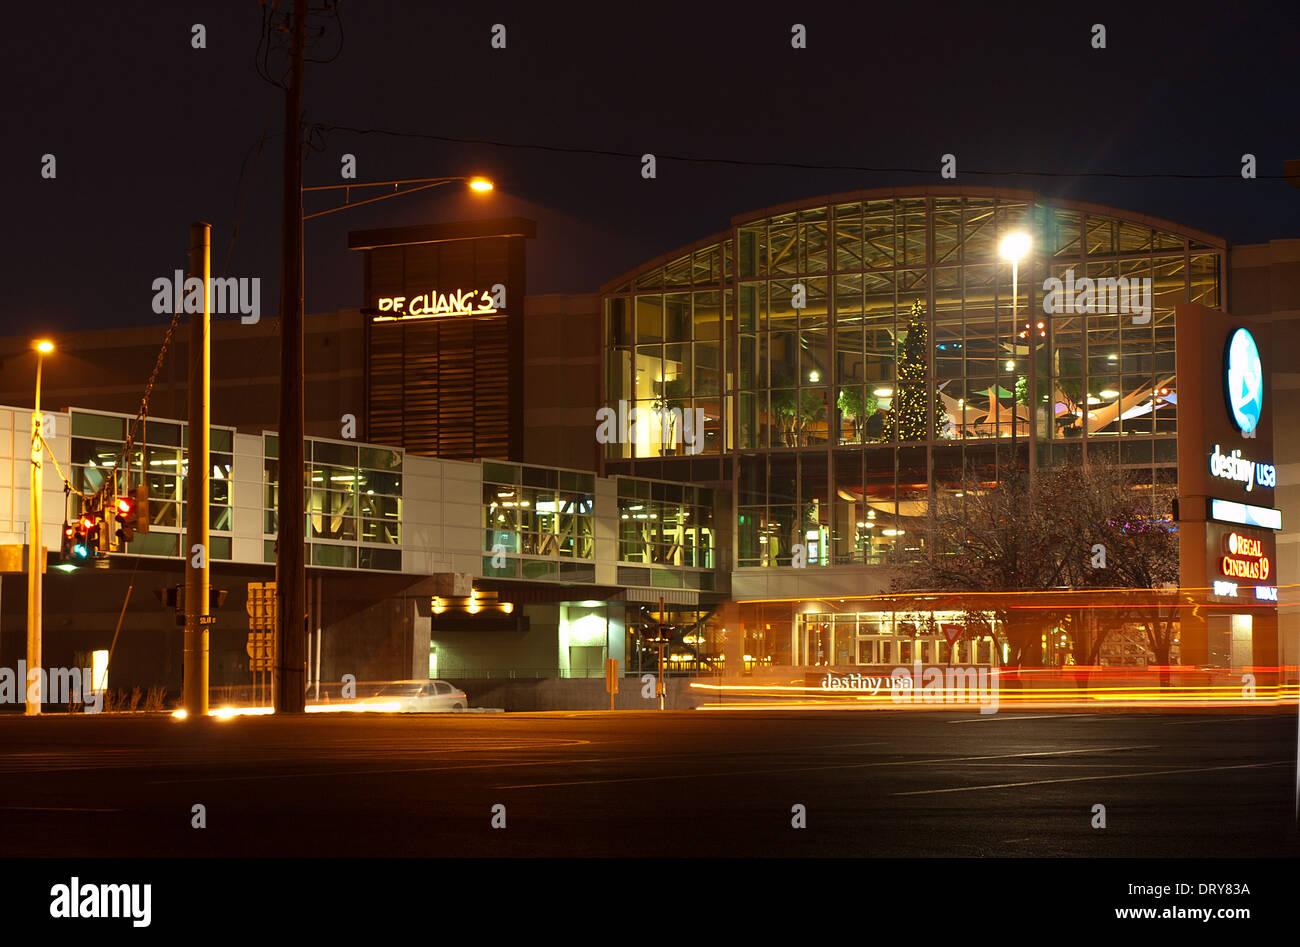 vans destiny mall